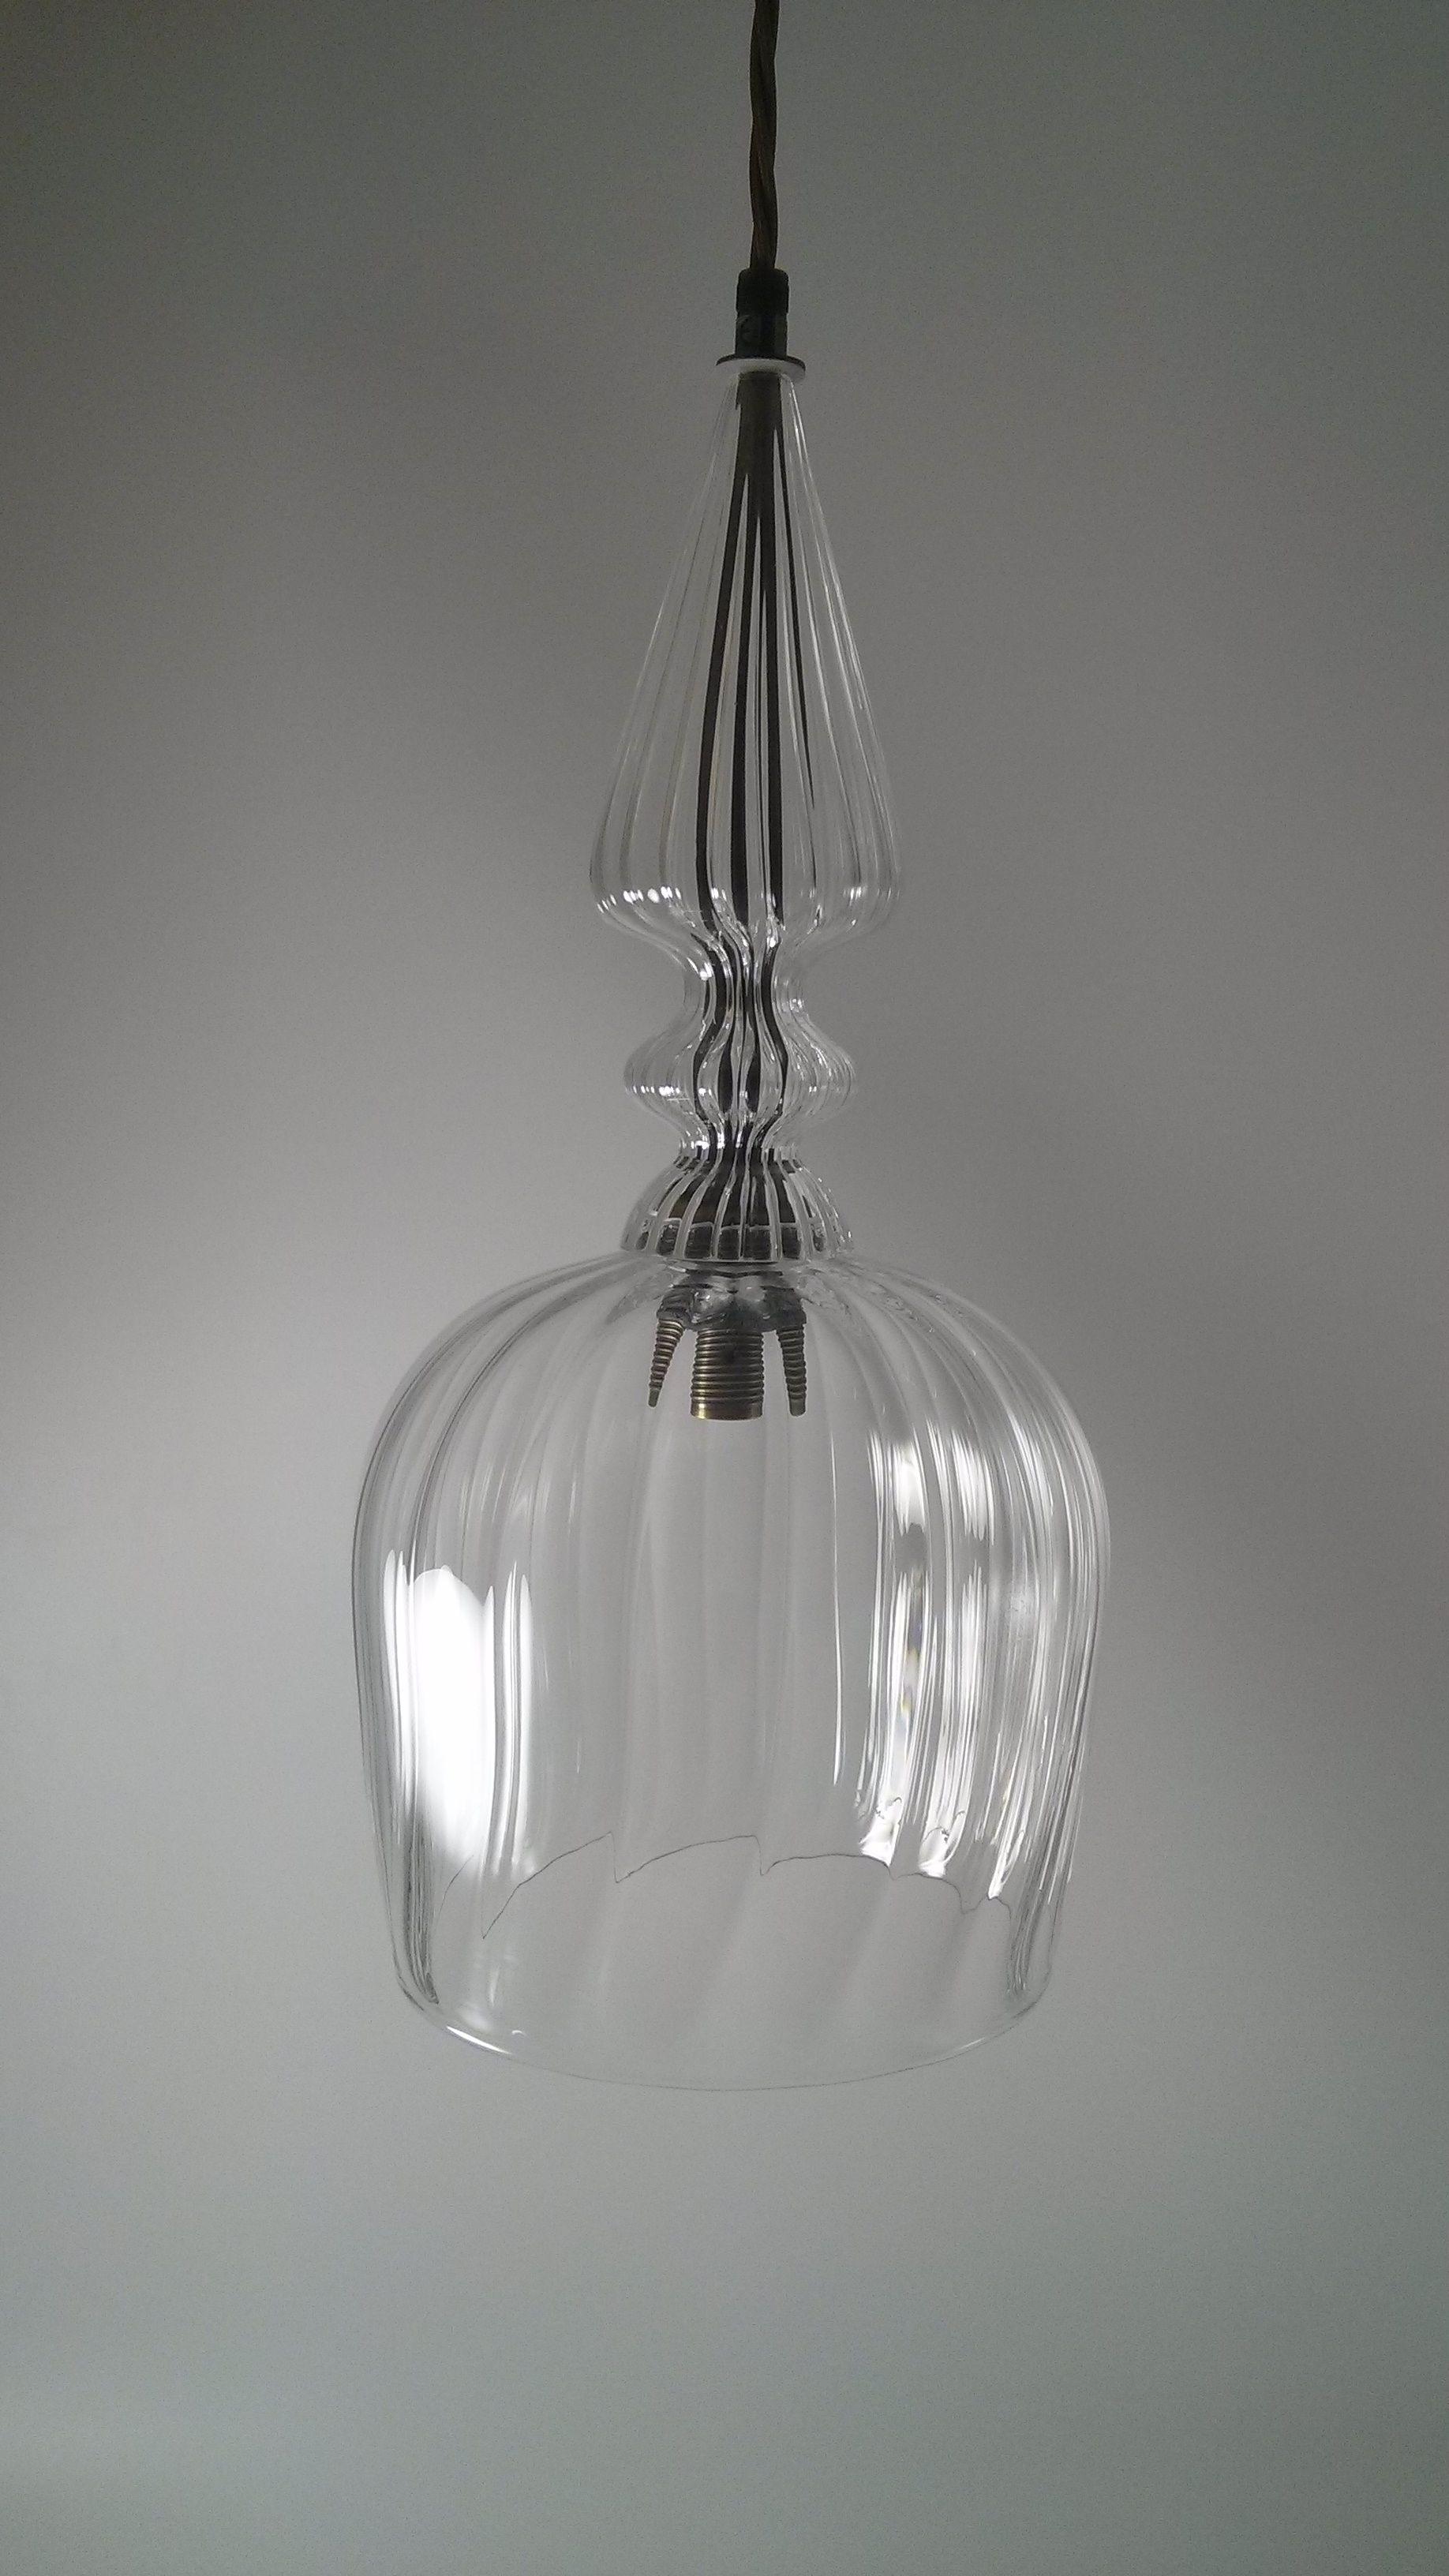 Inspirational Pendant Light Shades